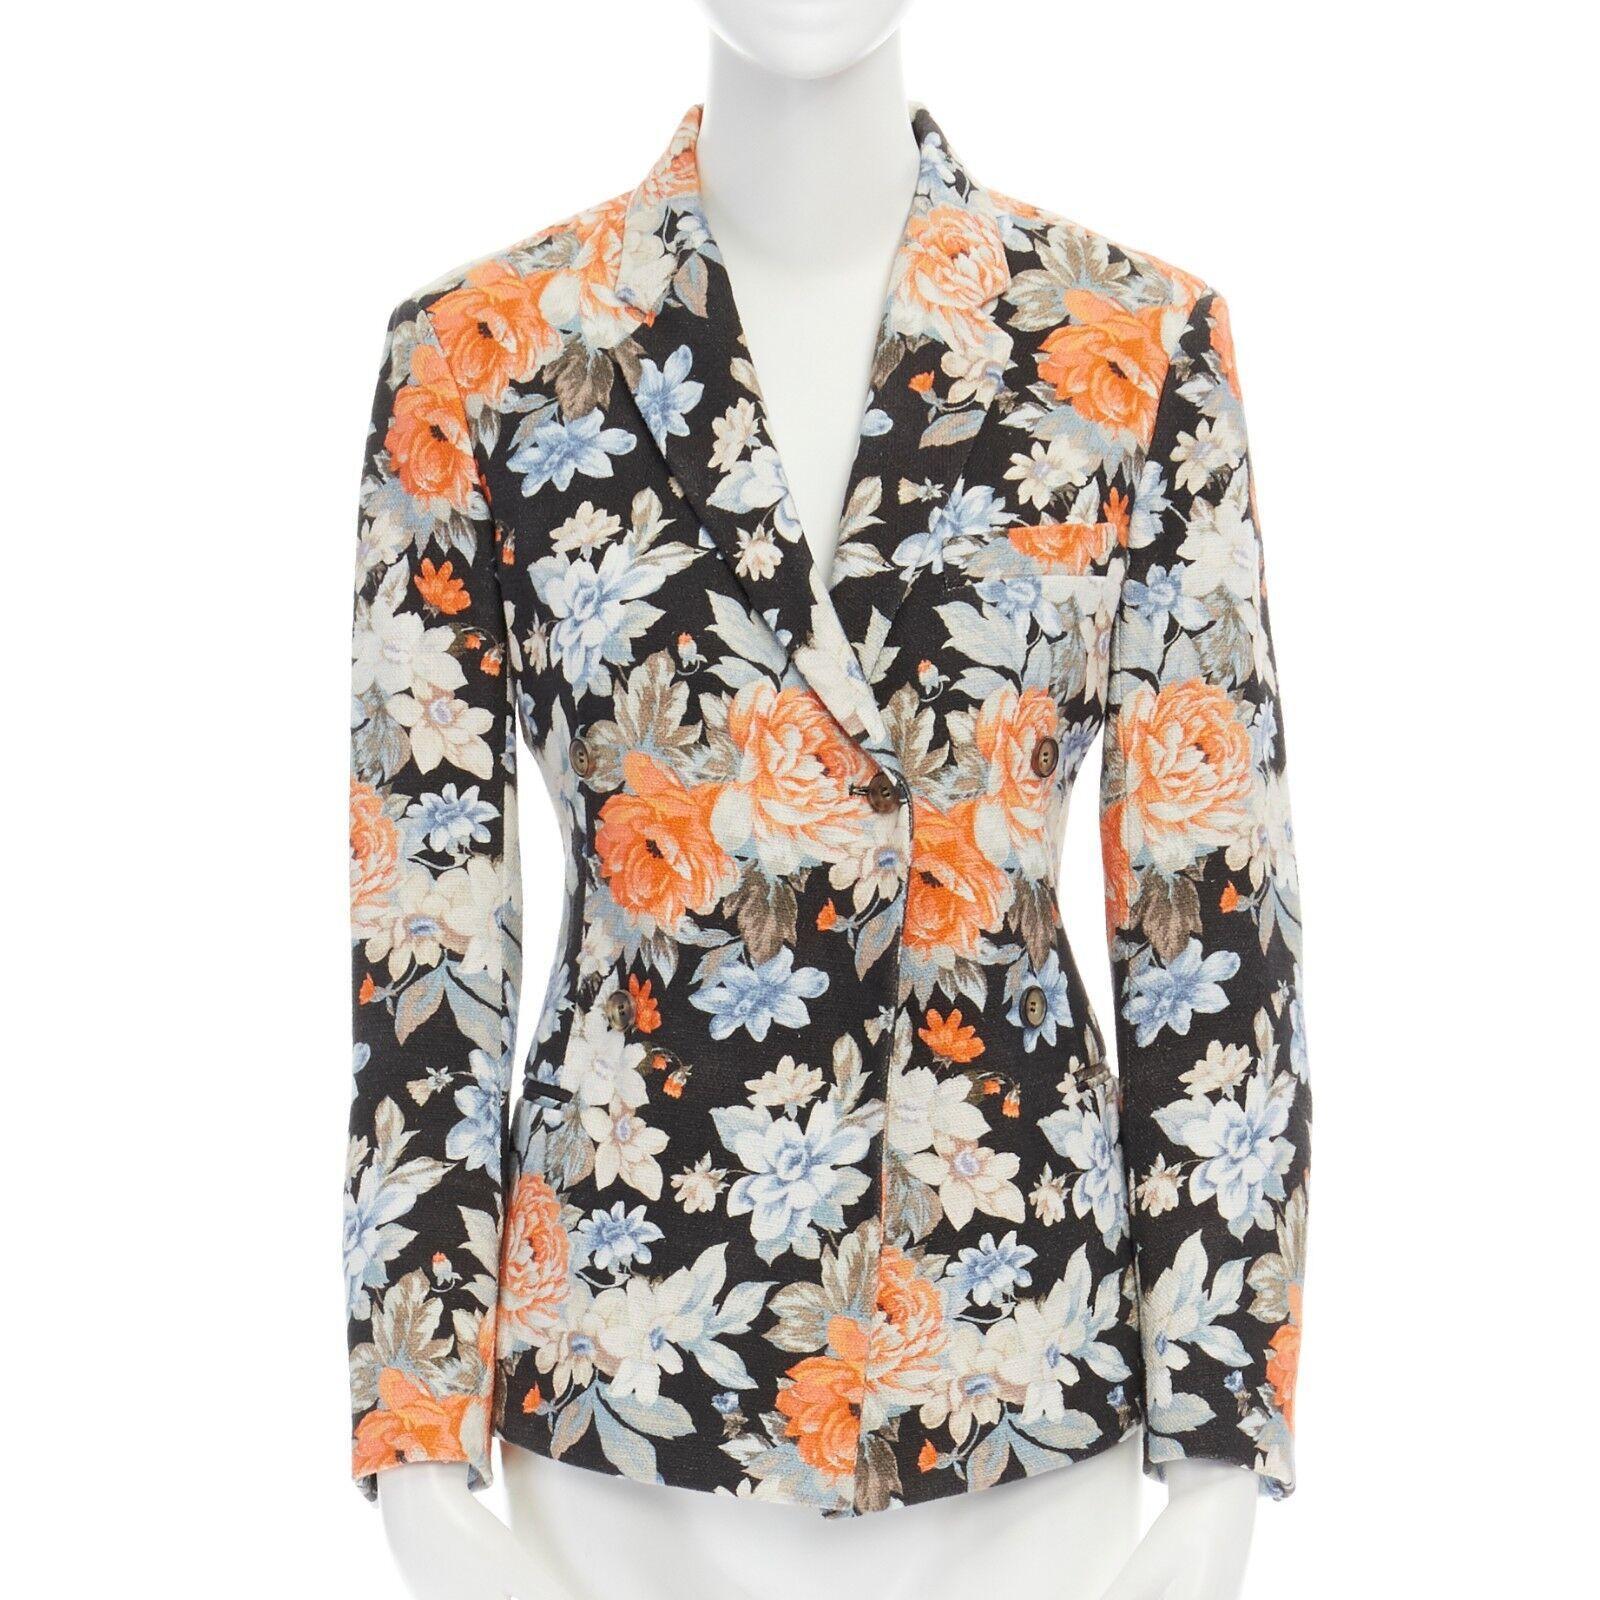 CELINE PHOEBE PHILO Estampado Floral  Chaqueta Blazer de lana de algodón Doble Abotonadura FR36  soporte minorista mayorista